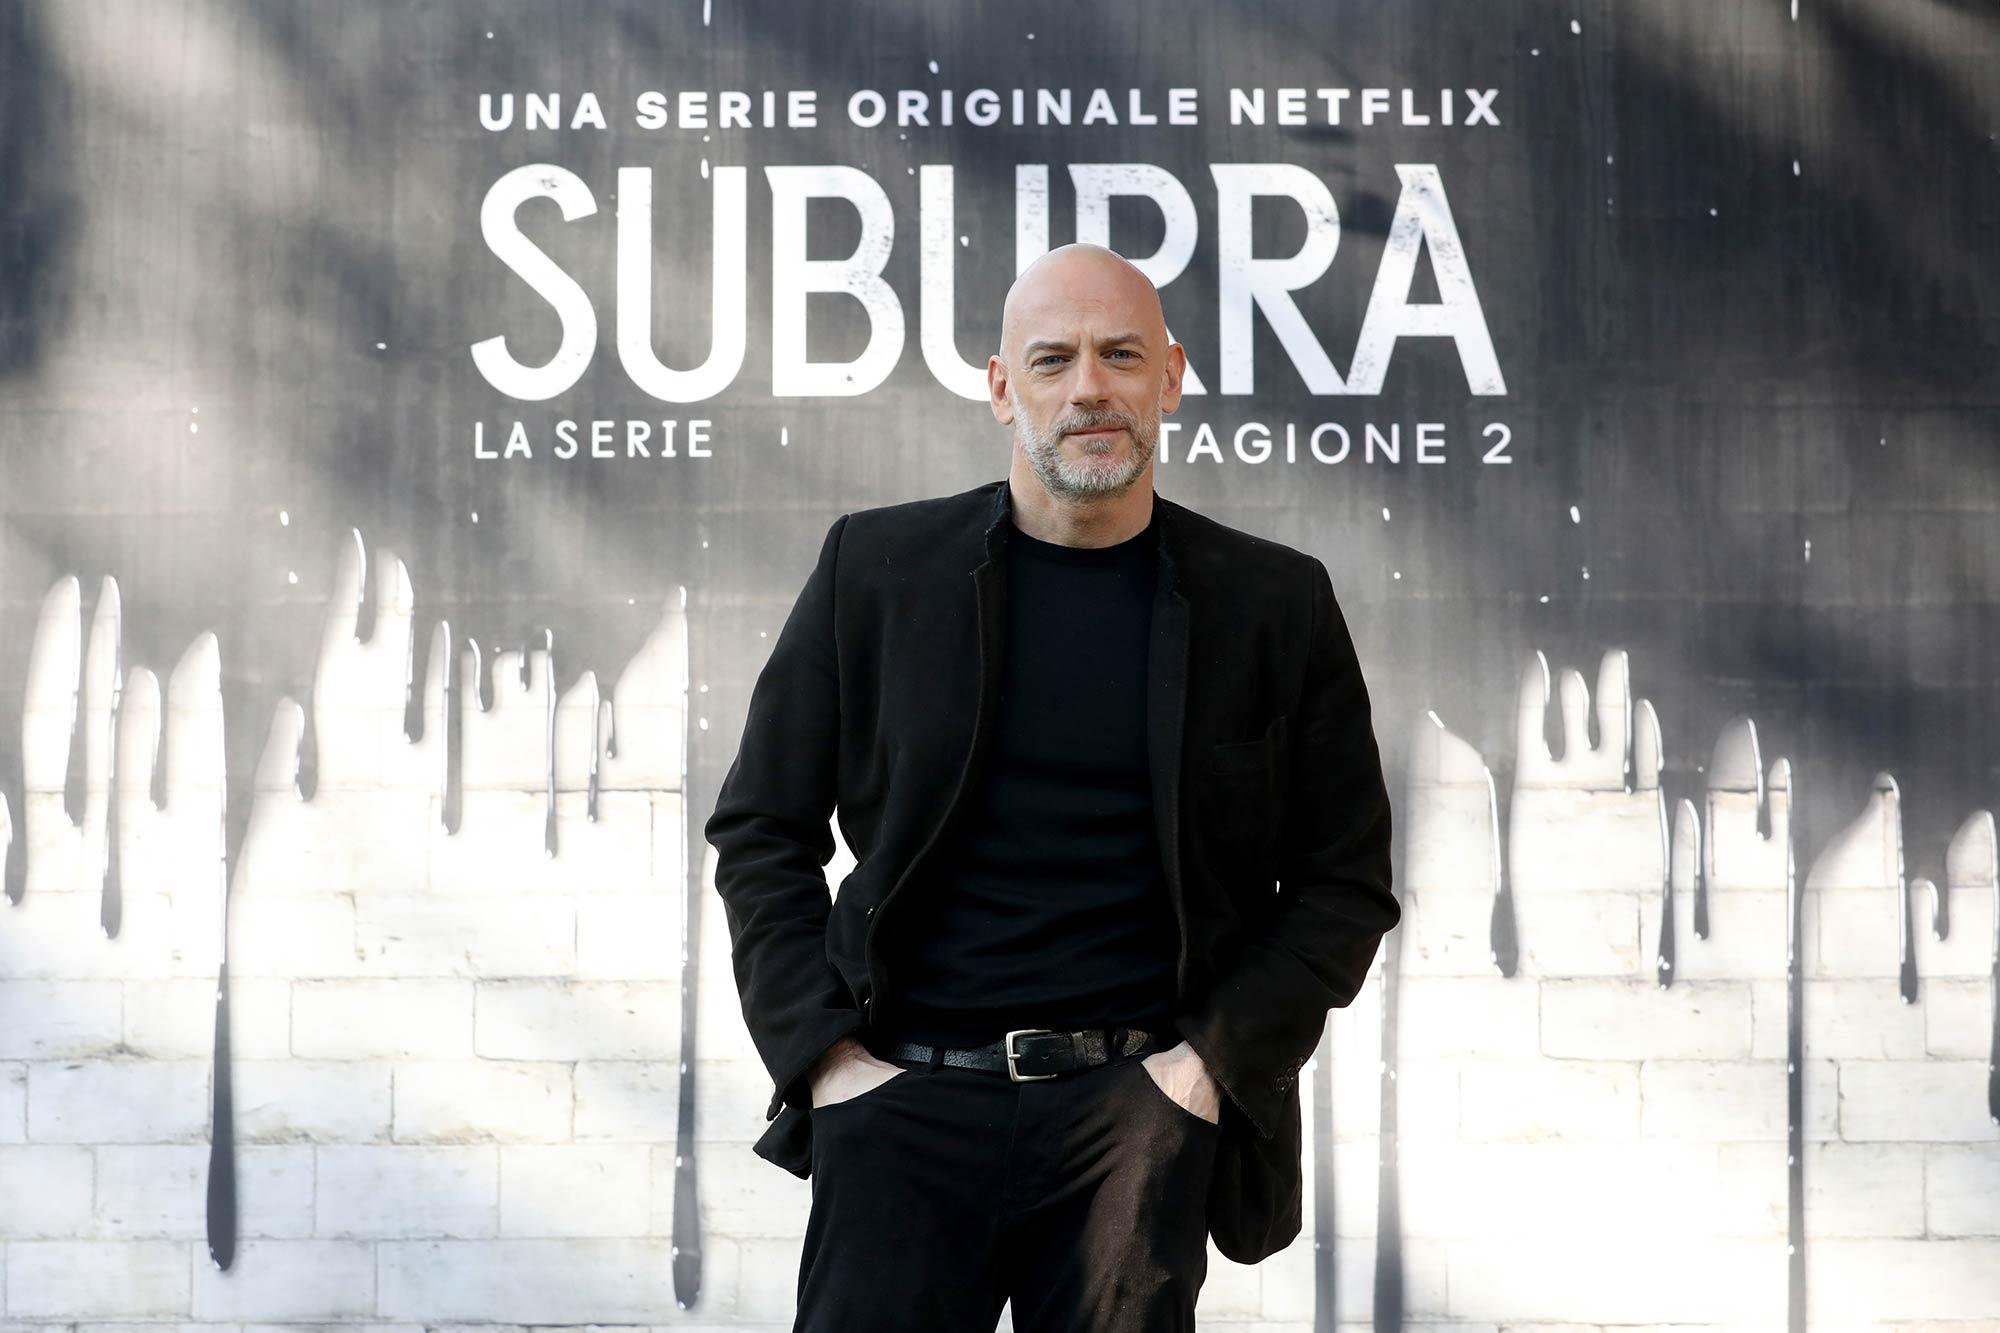 Netflix Premiere Suburra 2 - Filippo Nigro - Grooming Massimo Serini Team